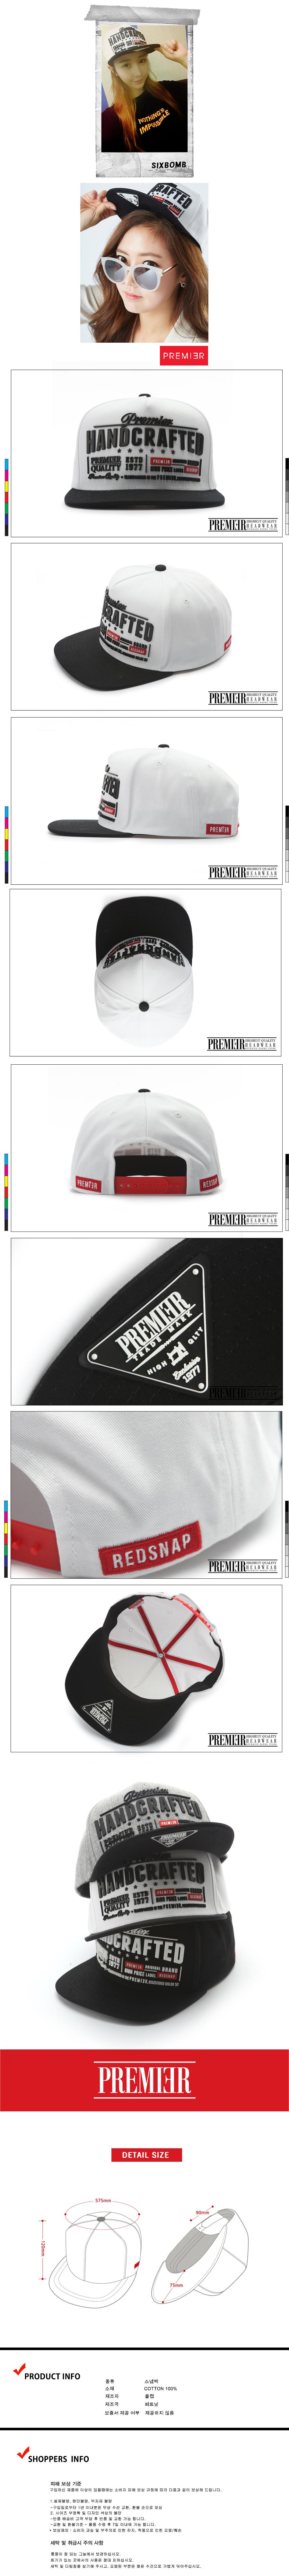 [ PREMIER ] [Premier] Red Snap Handcraft Lover White/Black